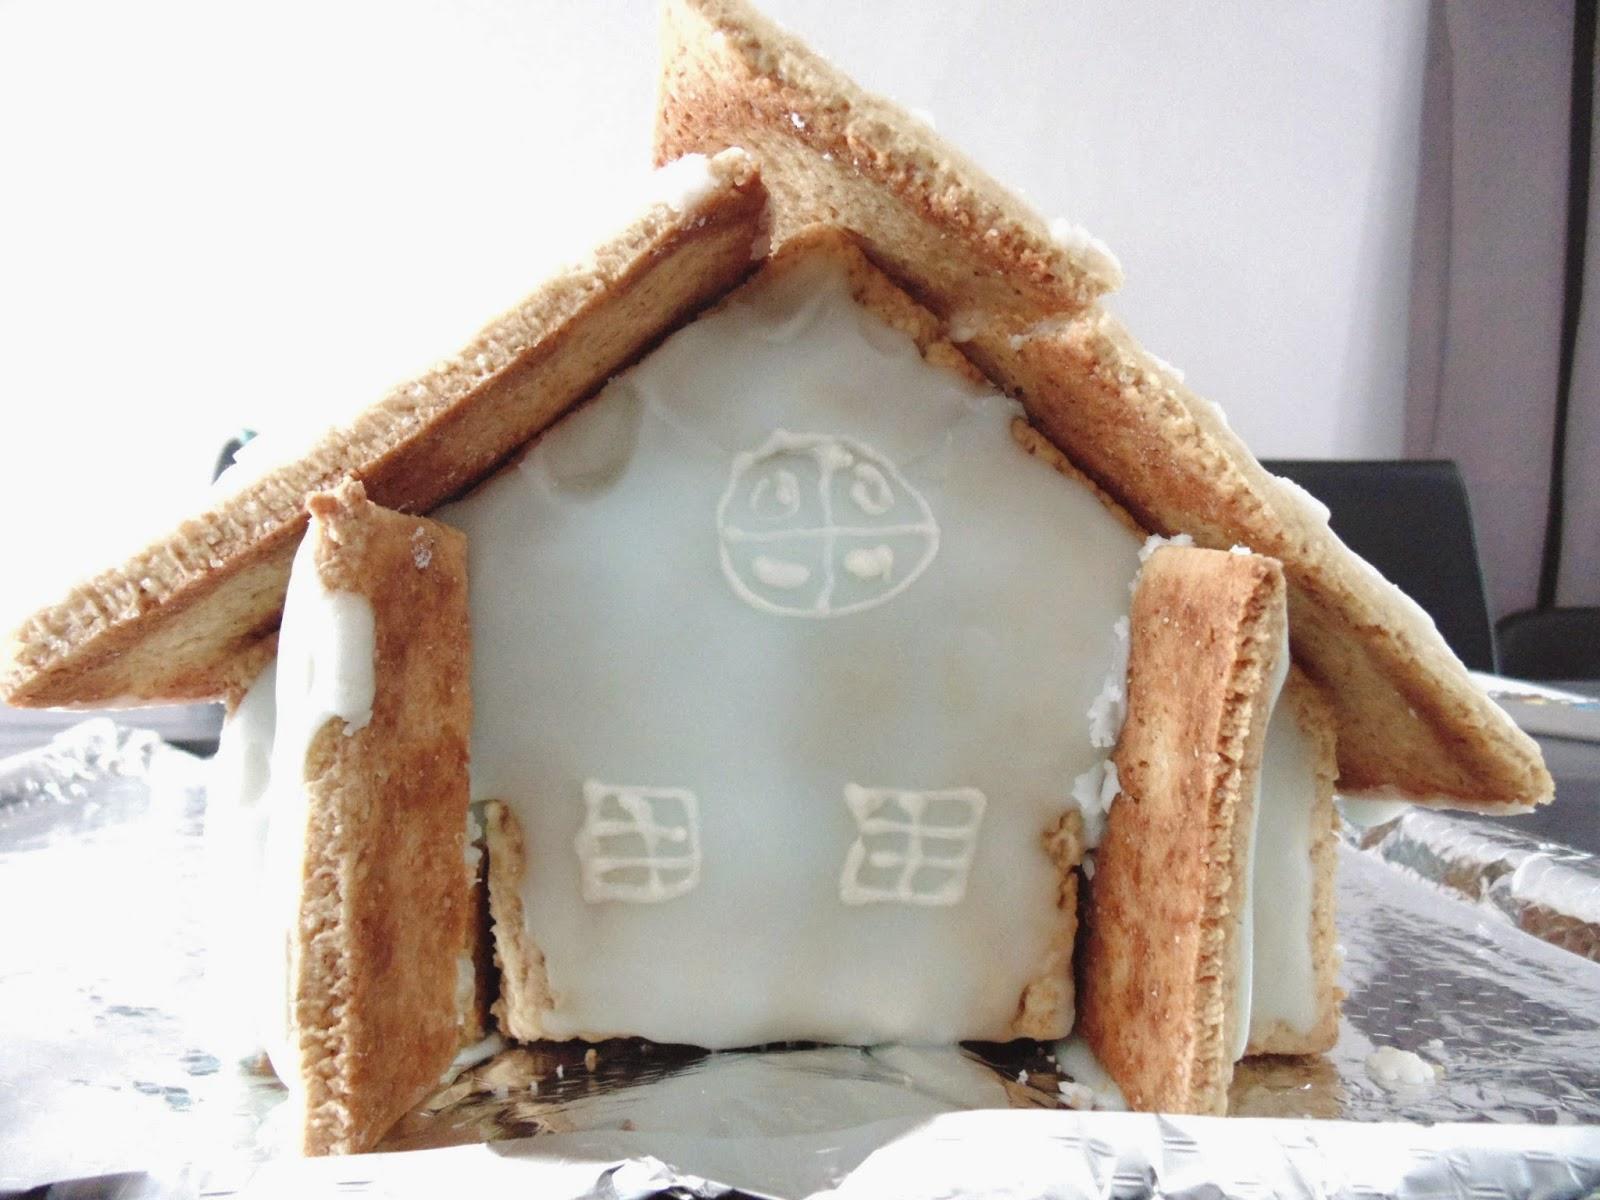 Gateau gaga love cakes maison en pain d 39 pices - Cuillere a miel ikea ...